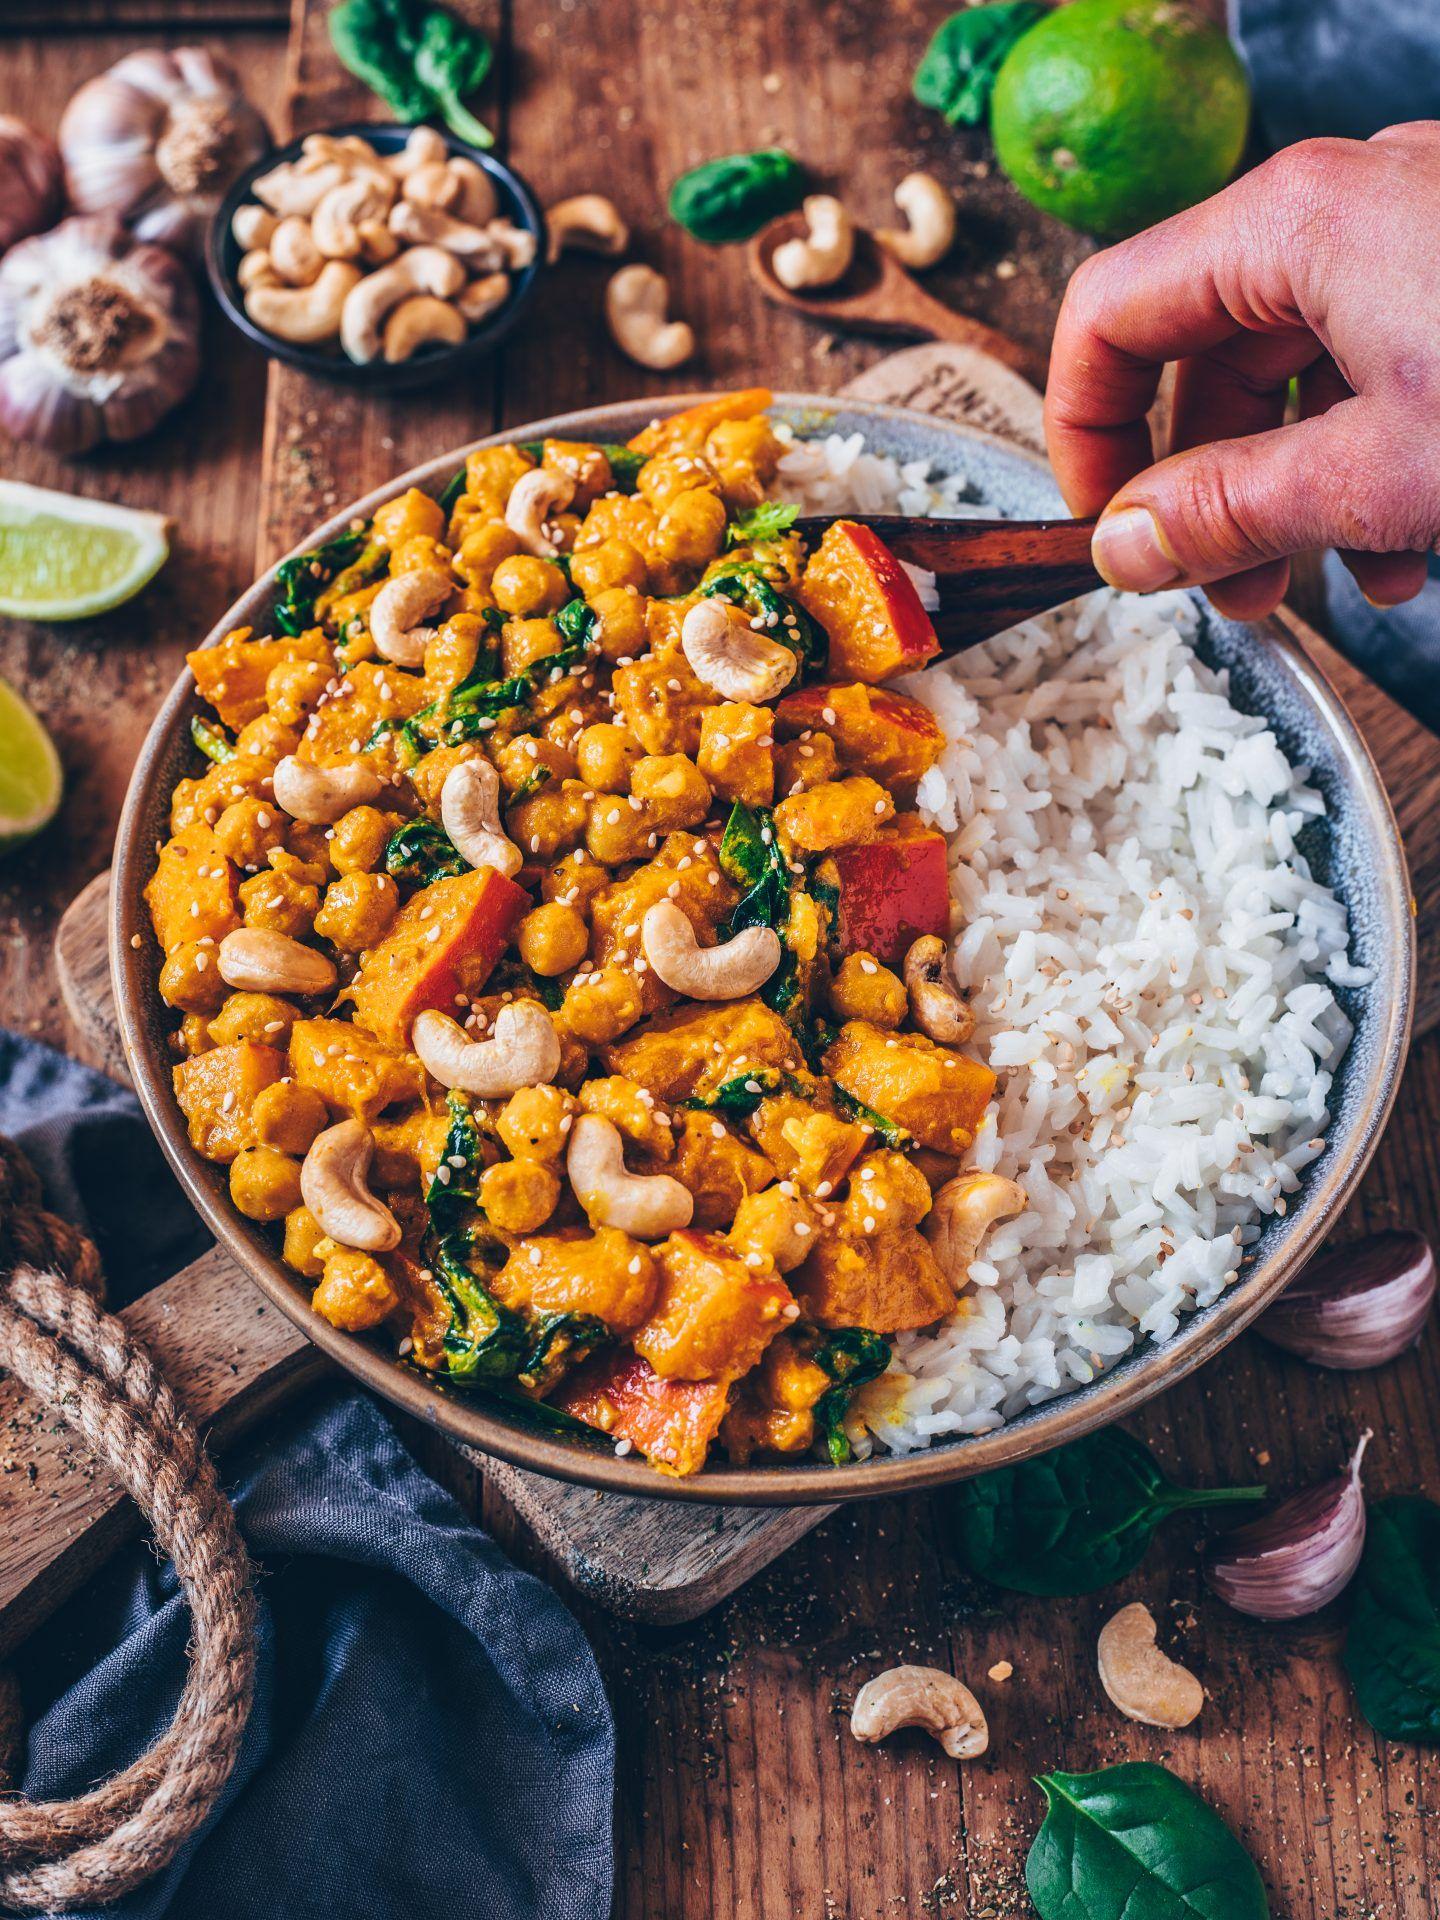 Kürbis-Kichererbsen-Curry (vegan, einfaches Rezept #foodsides